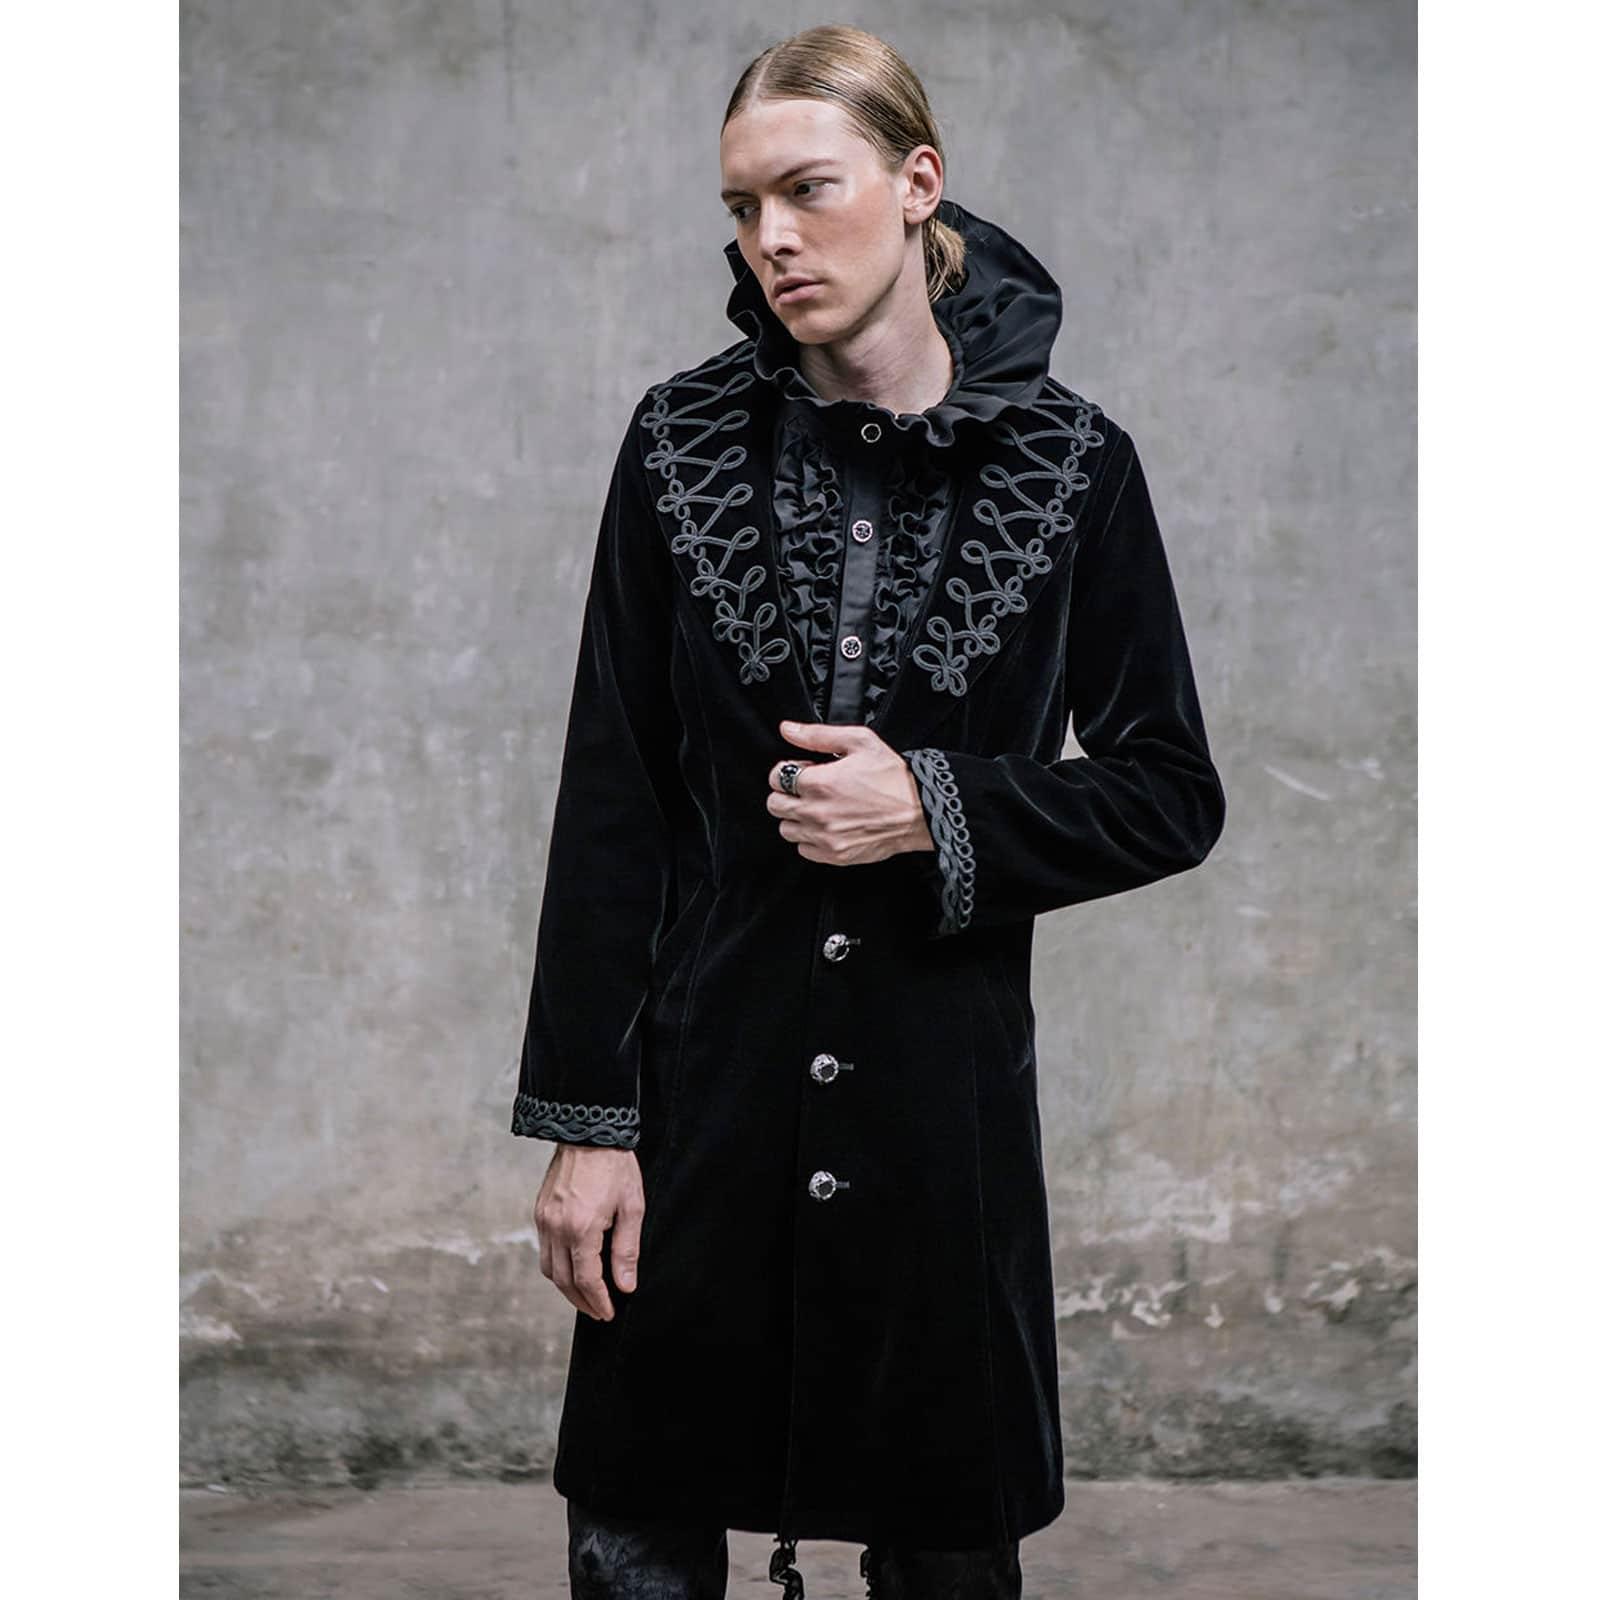 71359474c Akacia Mens Jacket Frock Coat, Black Velvet Jackets for Men, Mens Jacket,  Gothic